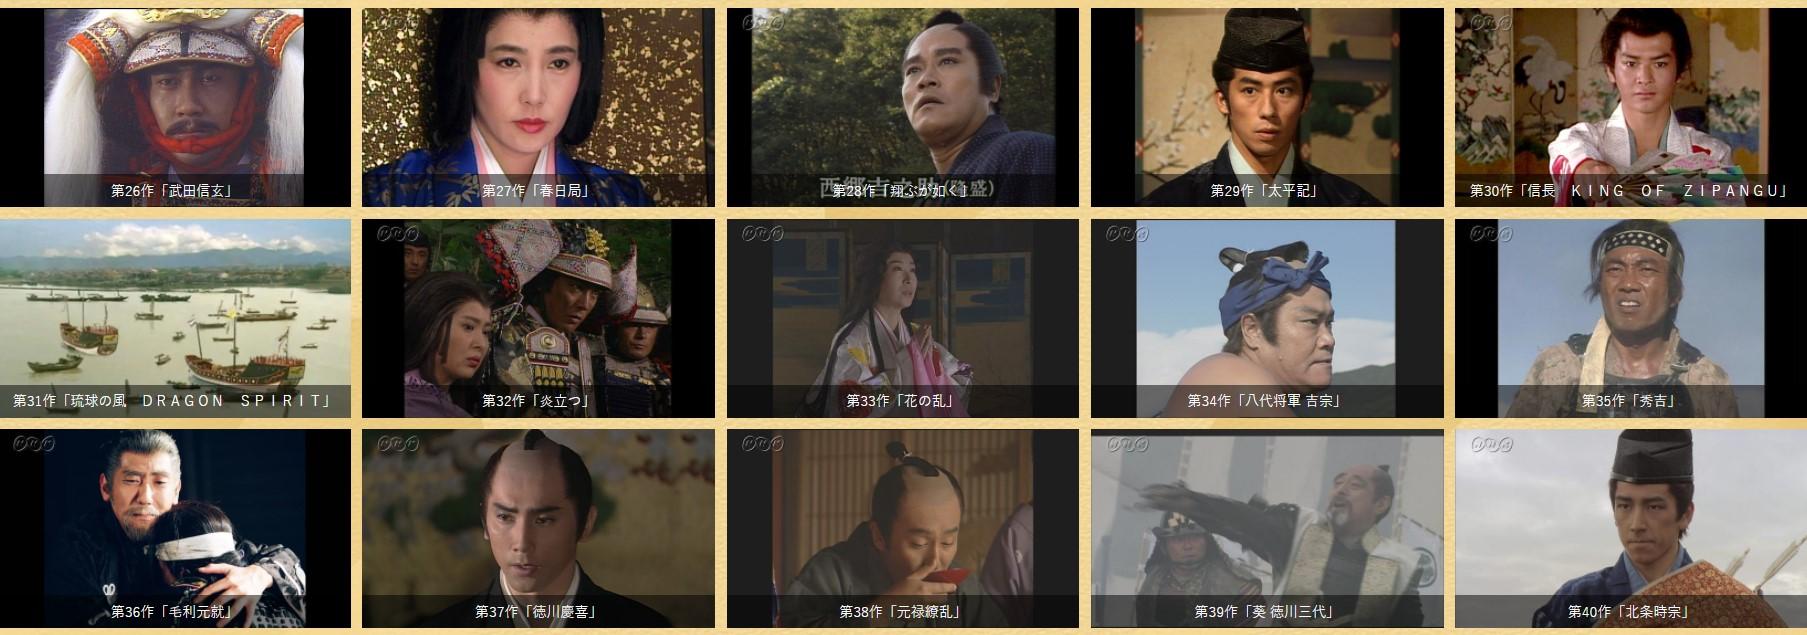 【NHK大河ドラマ】90年代の大河ドラマで一番好きな作品はどれ?【2021年版アンケート実施中】 | ねとらぼ調査隊